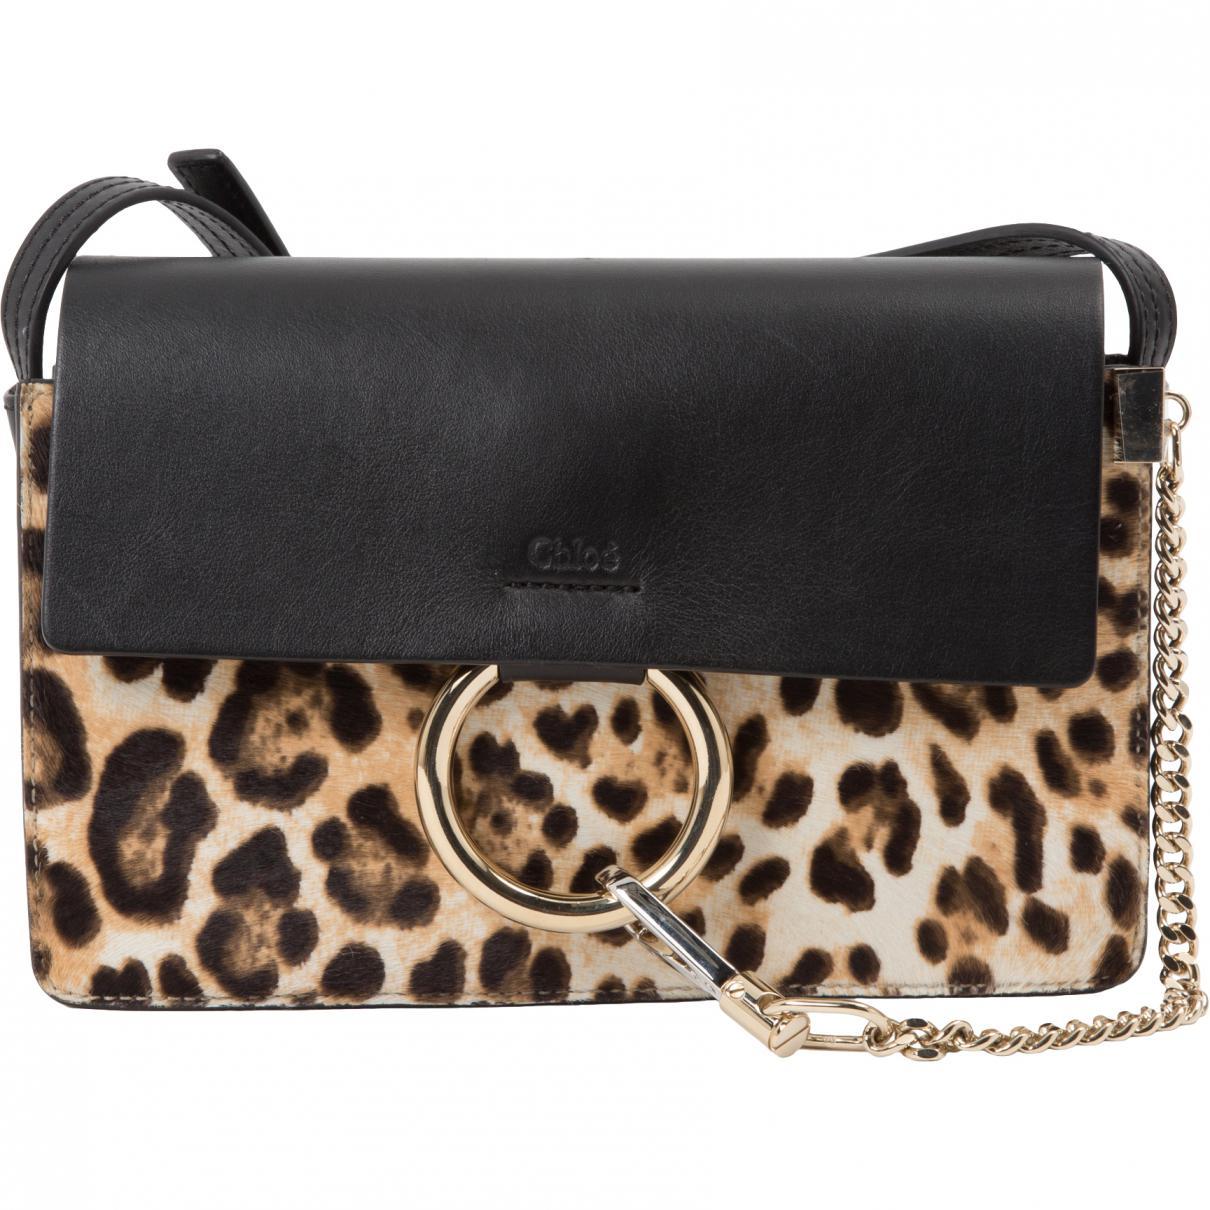 Gucci Pre-owned - Pony-style calfskin handbag kLt3M